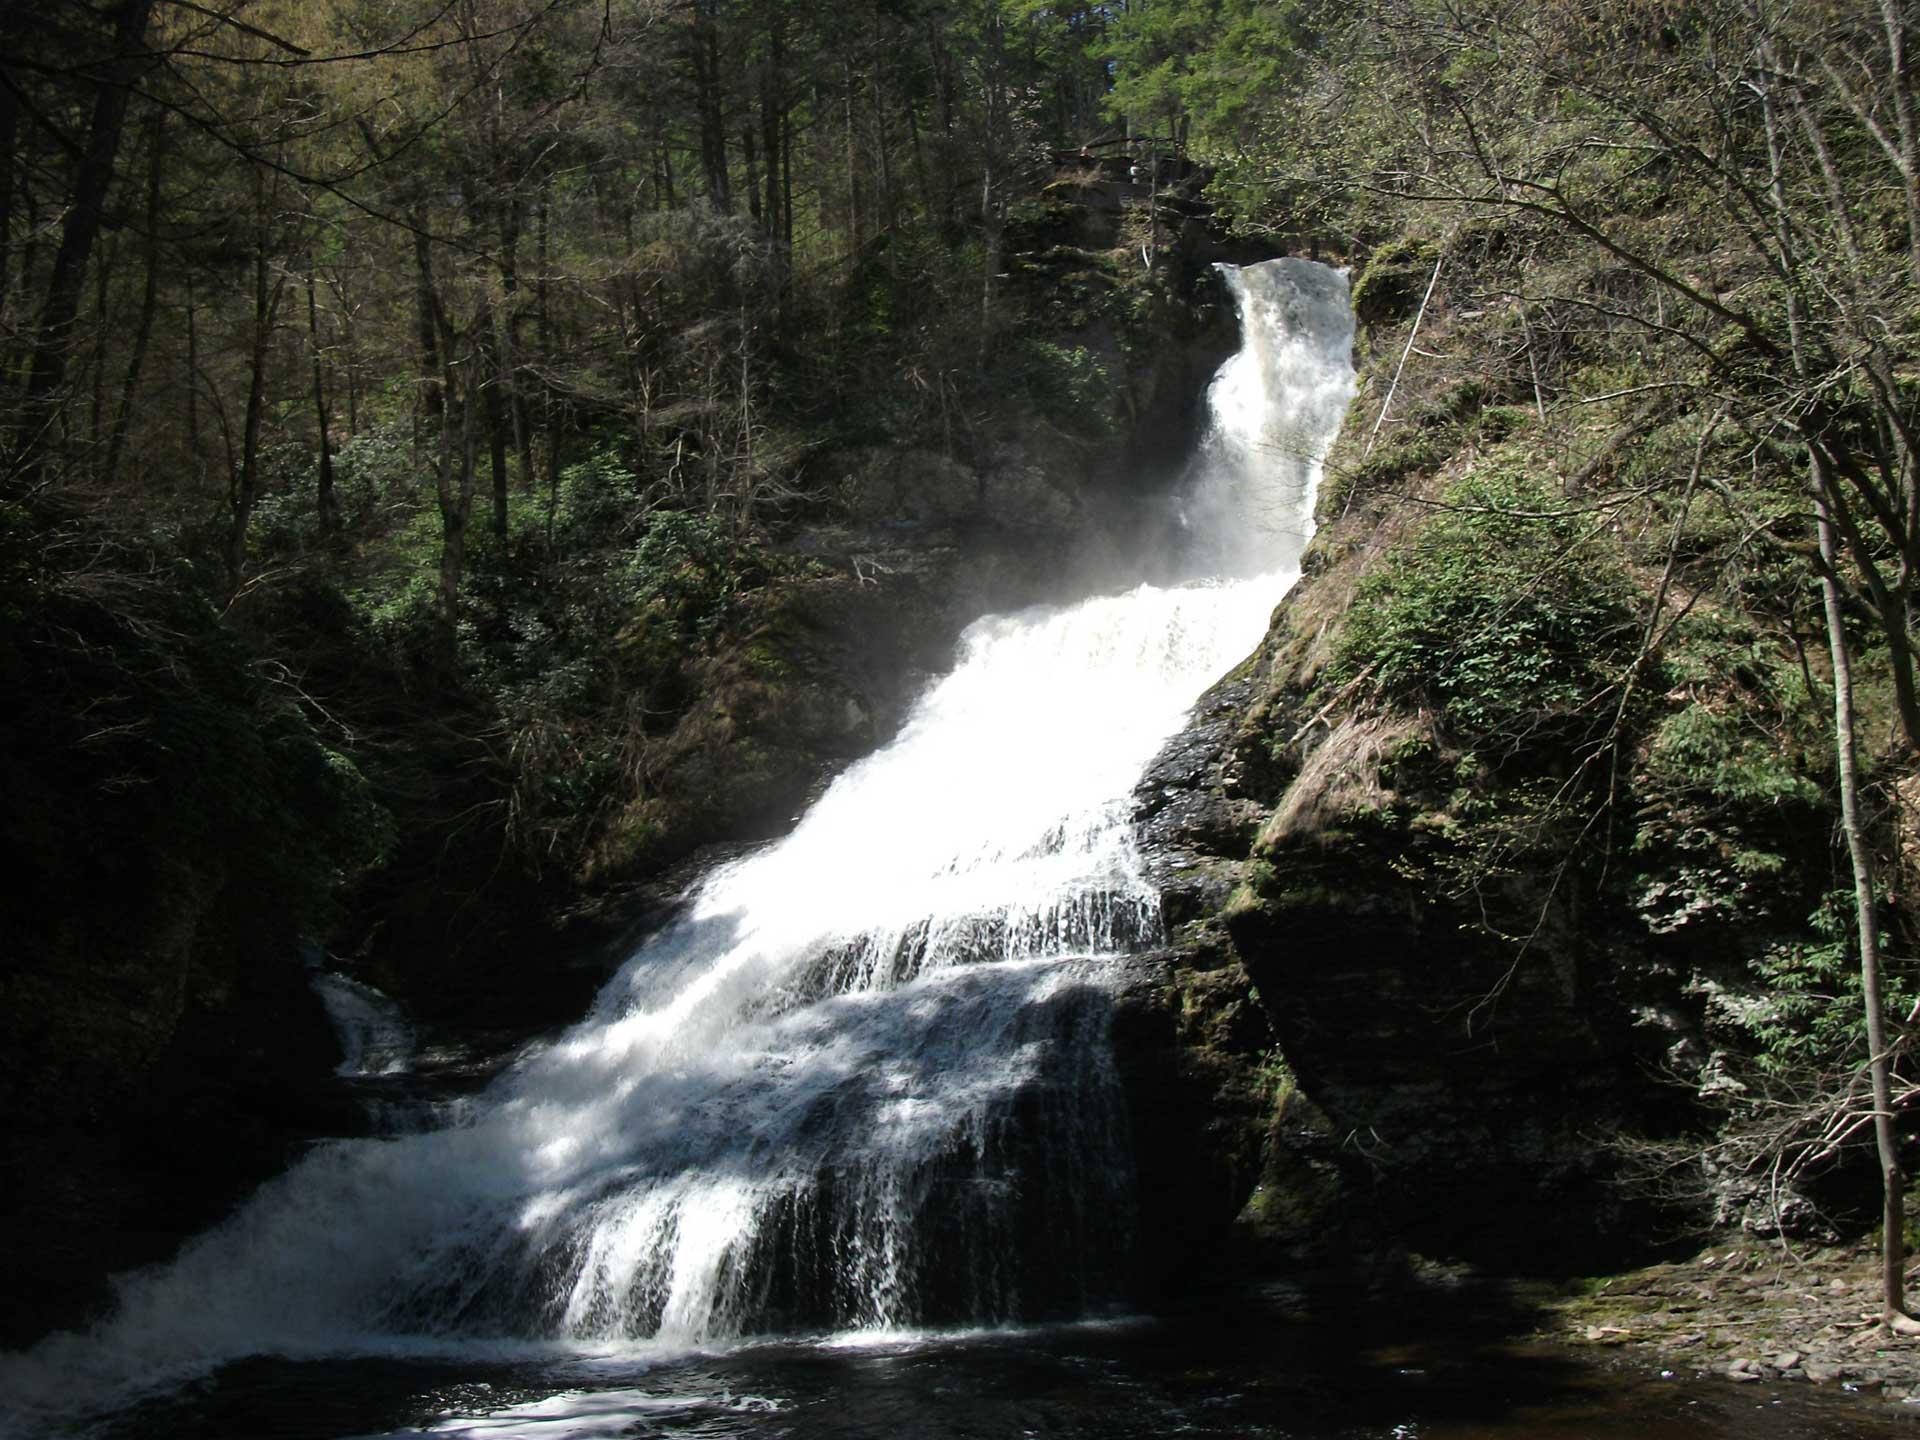 water flowing down dingmans falls in the woods